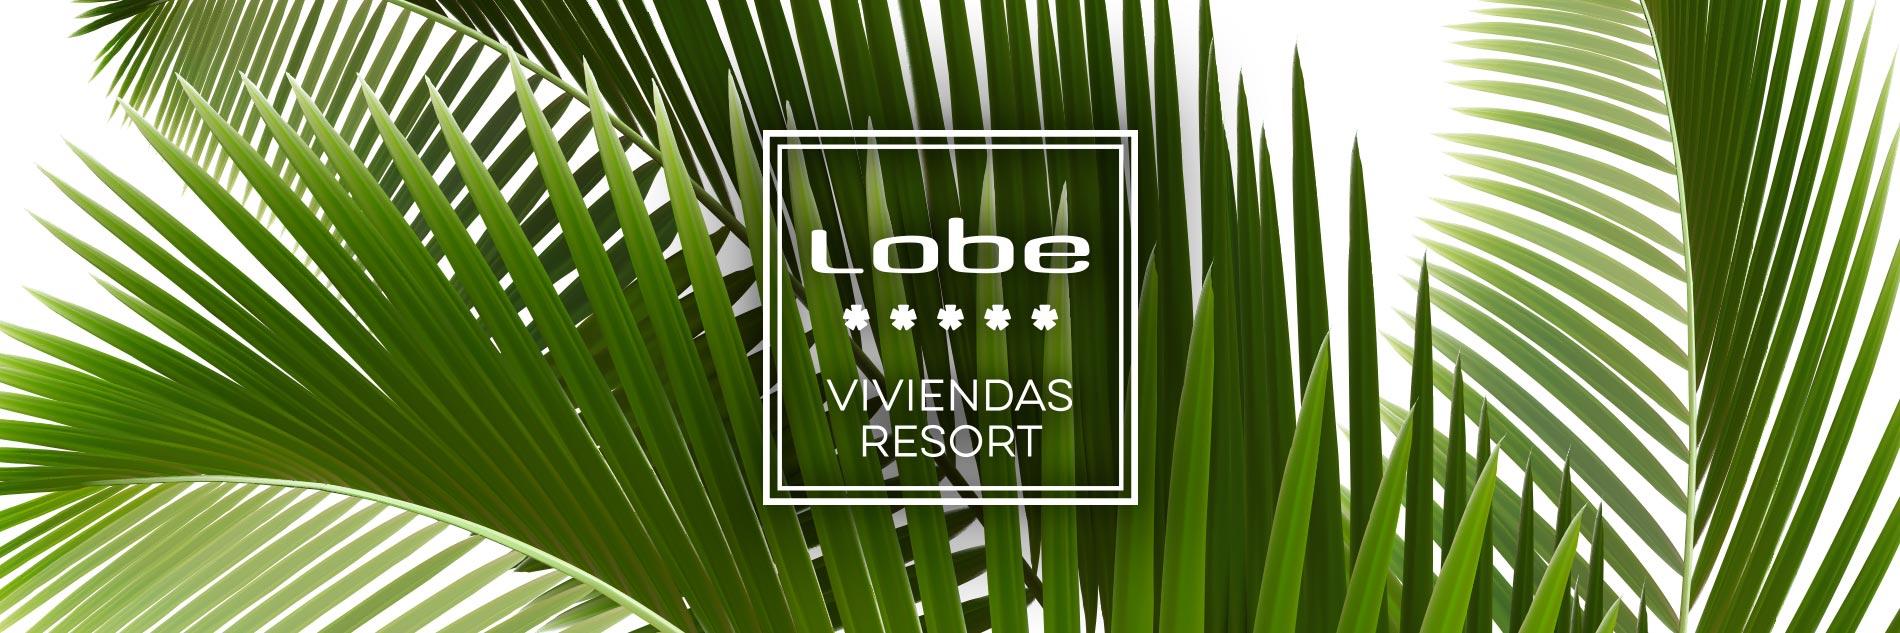 Imagen de campaña Viviendas Resort. Grupo Lobe